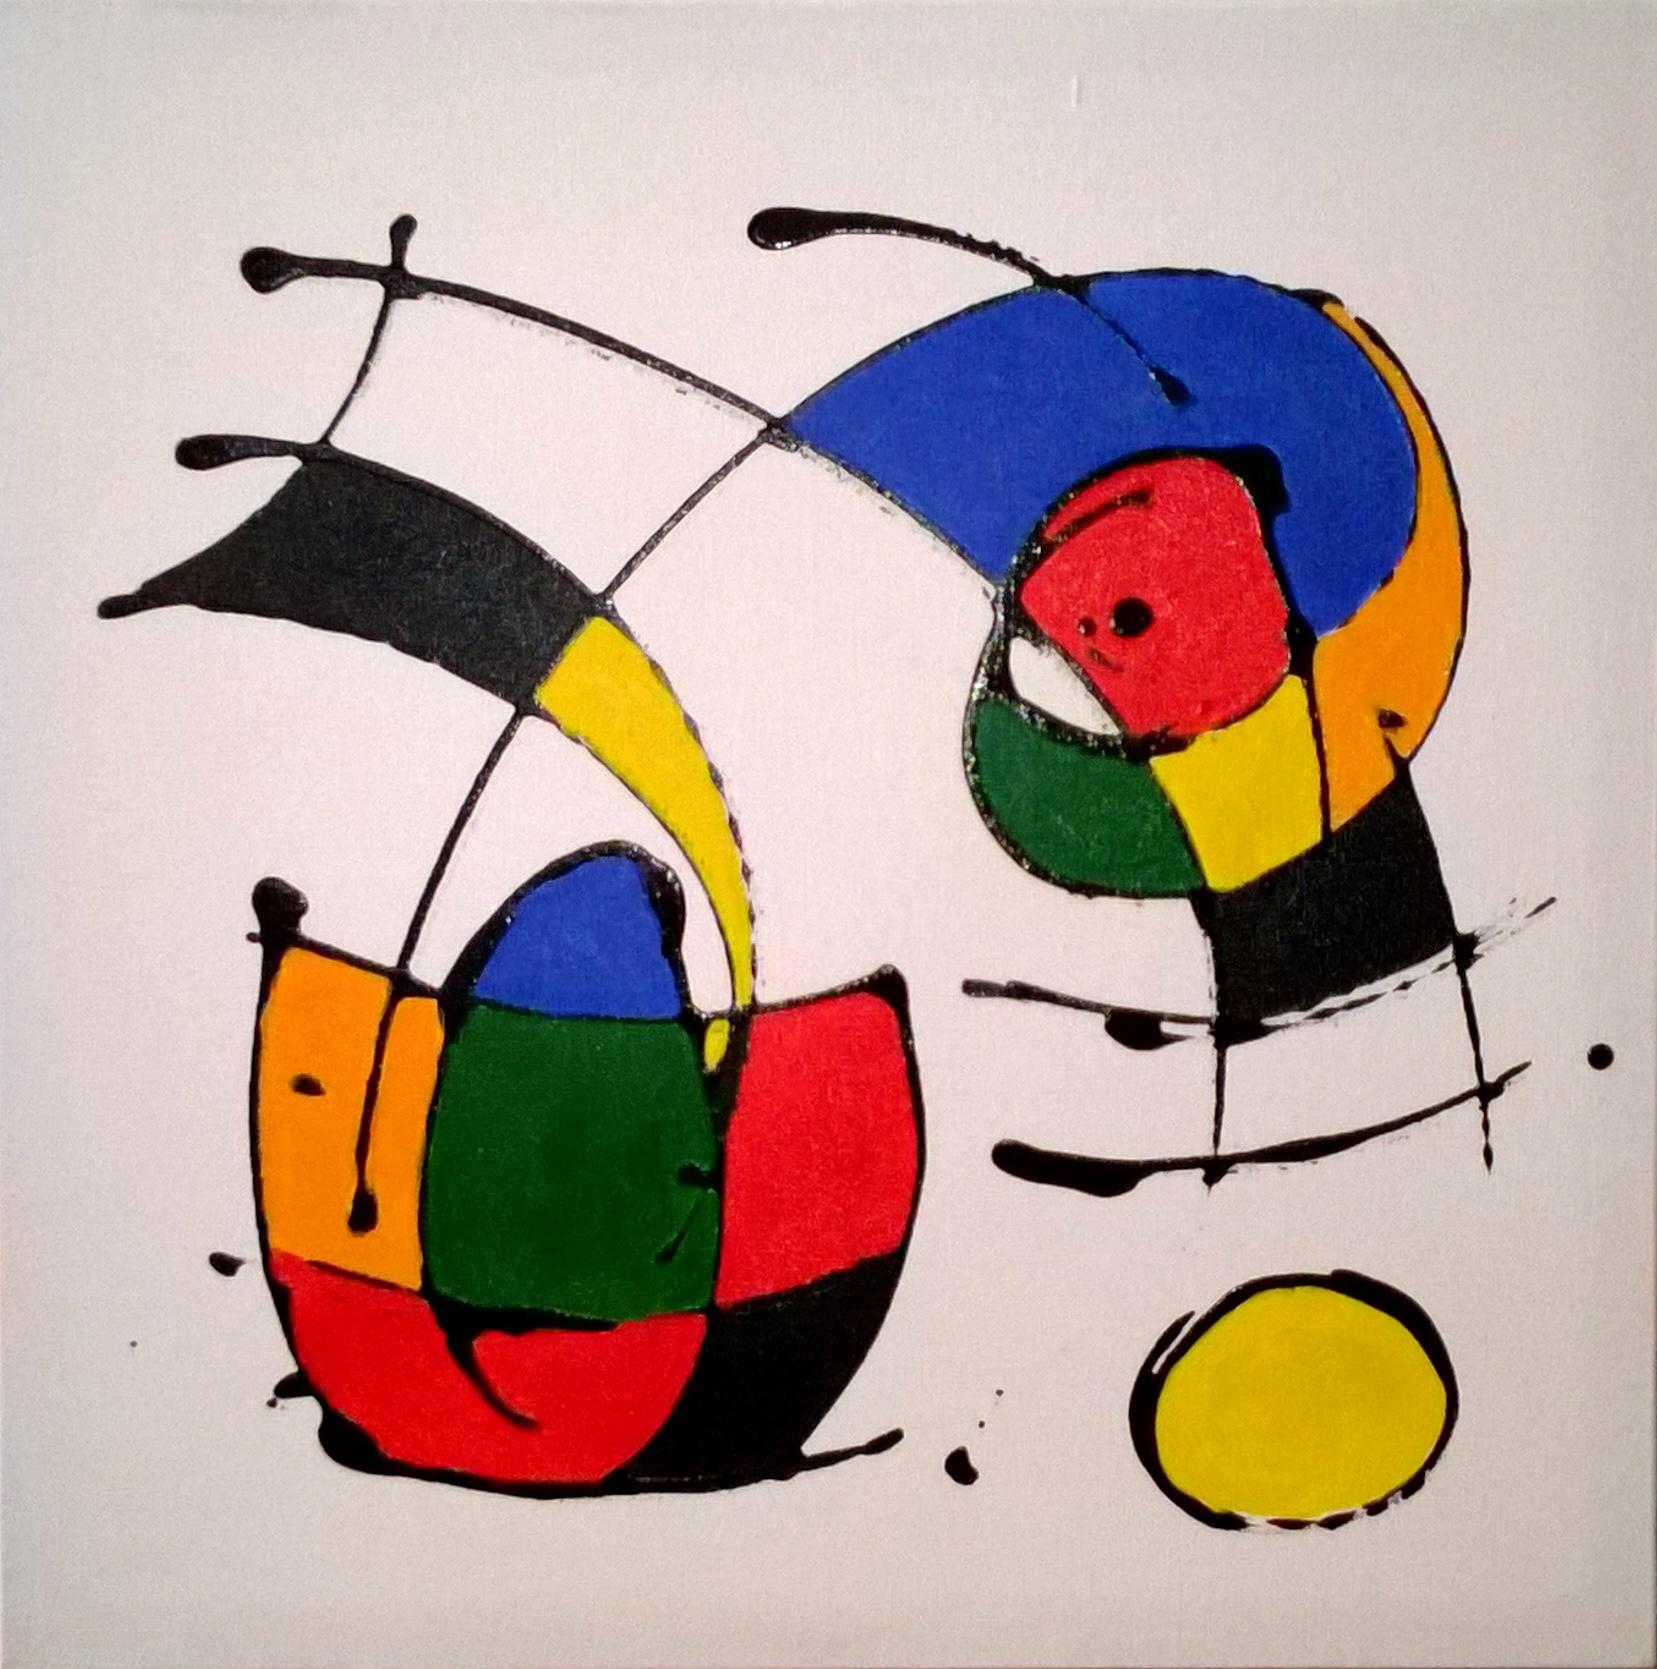 Releitura Miró 40x40 Cod 683 | KATIA ALMEIDA - PINTURAS EM TELAS ...